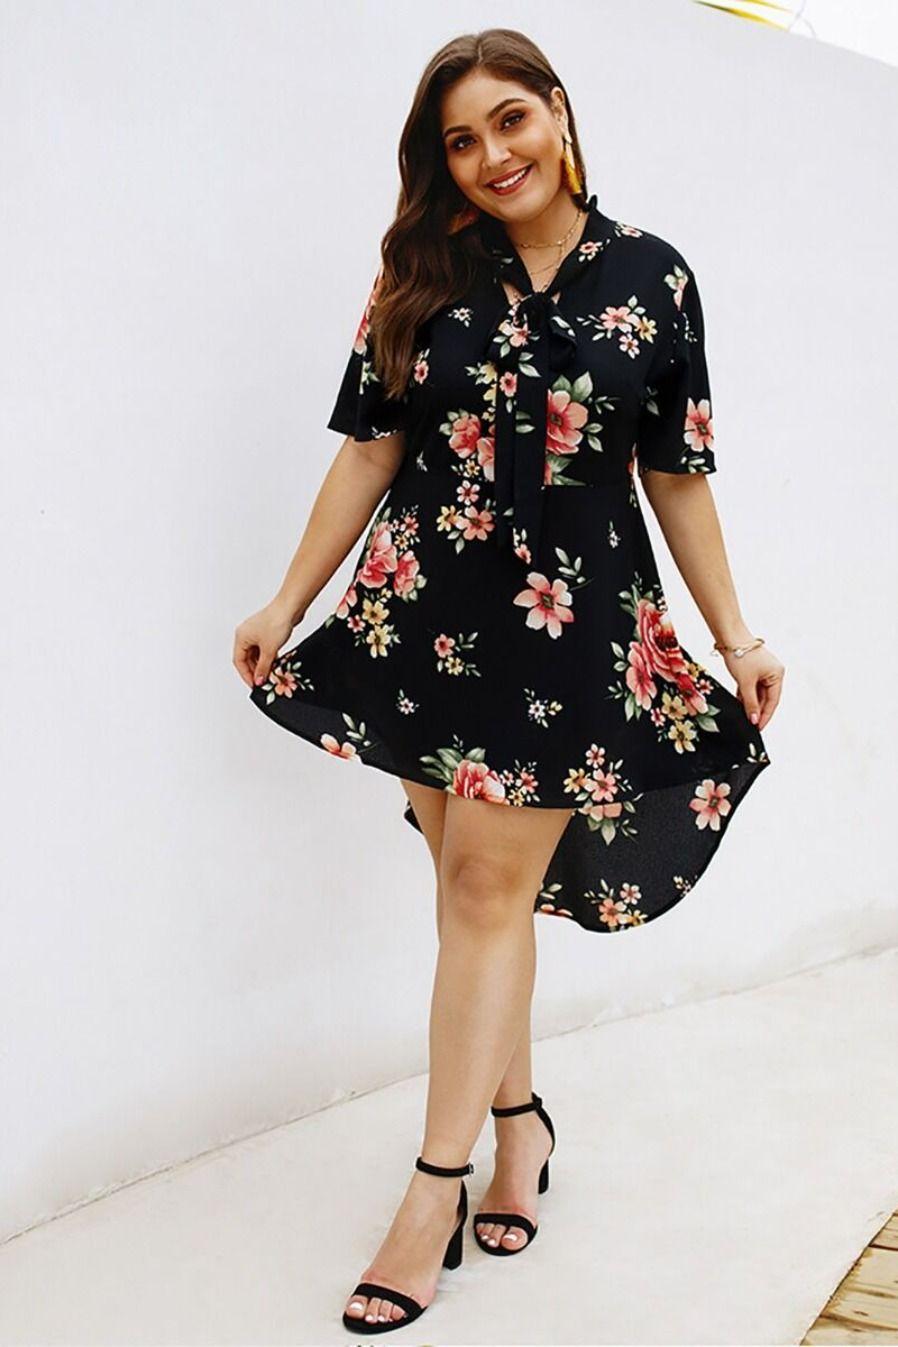 #dress #plussize #plussizedress #floraldress #tie #holiday #chic #wholesale